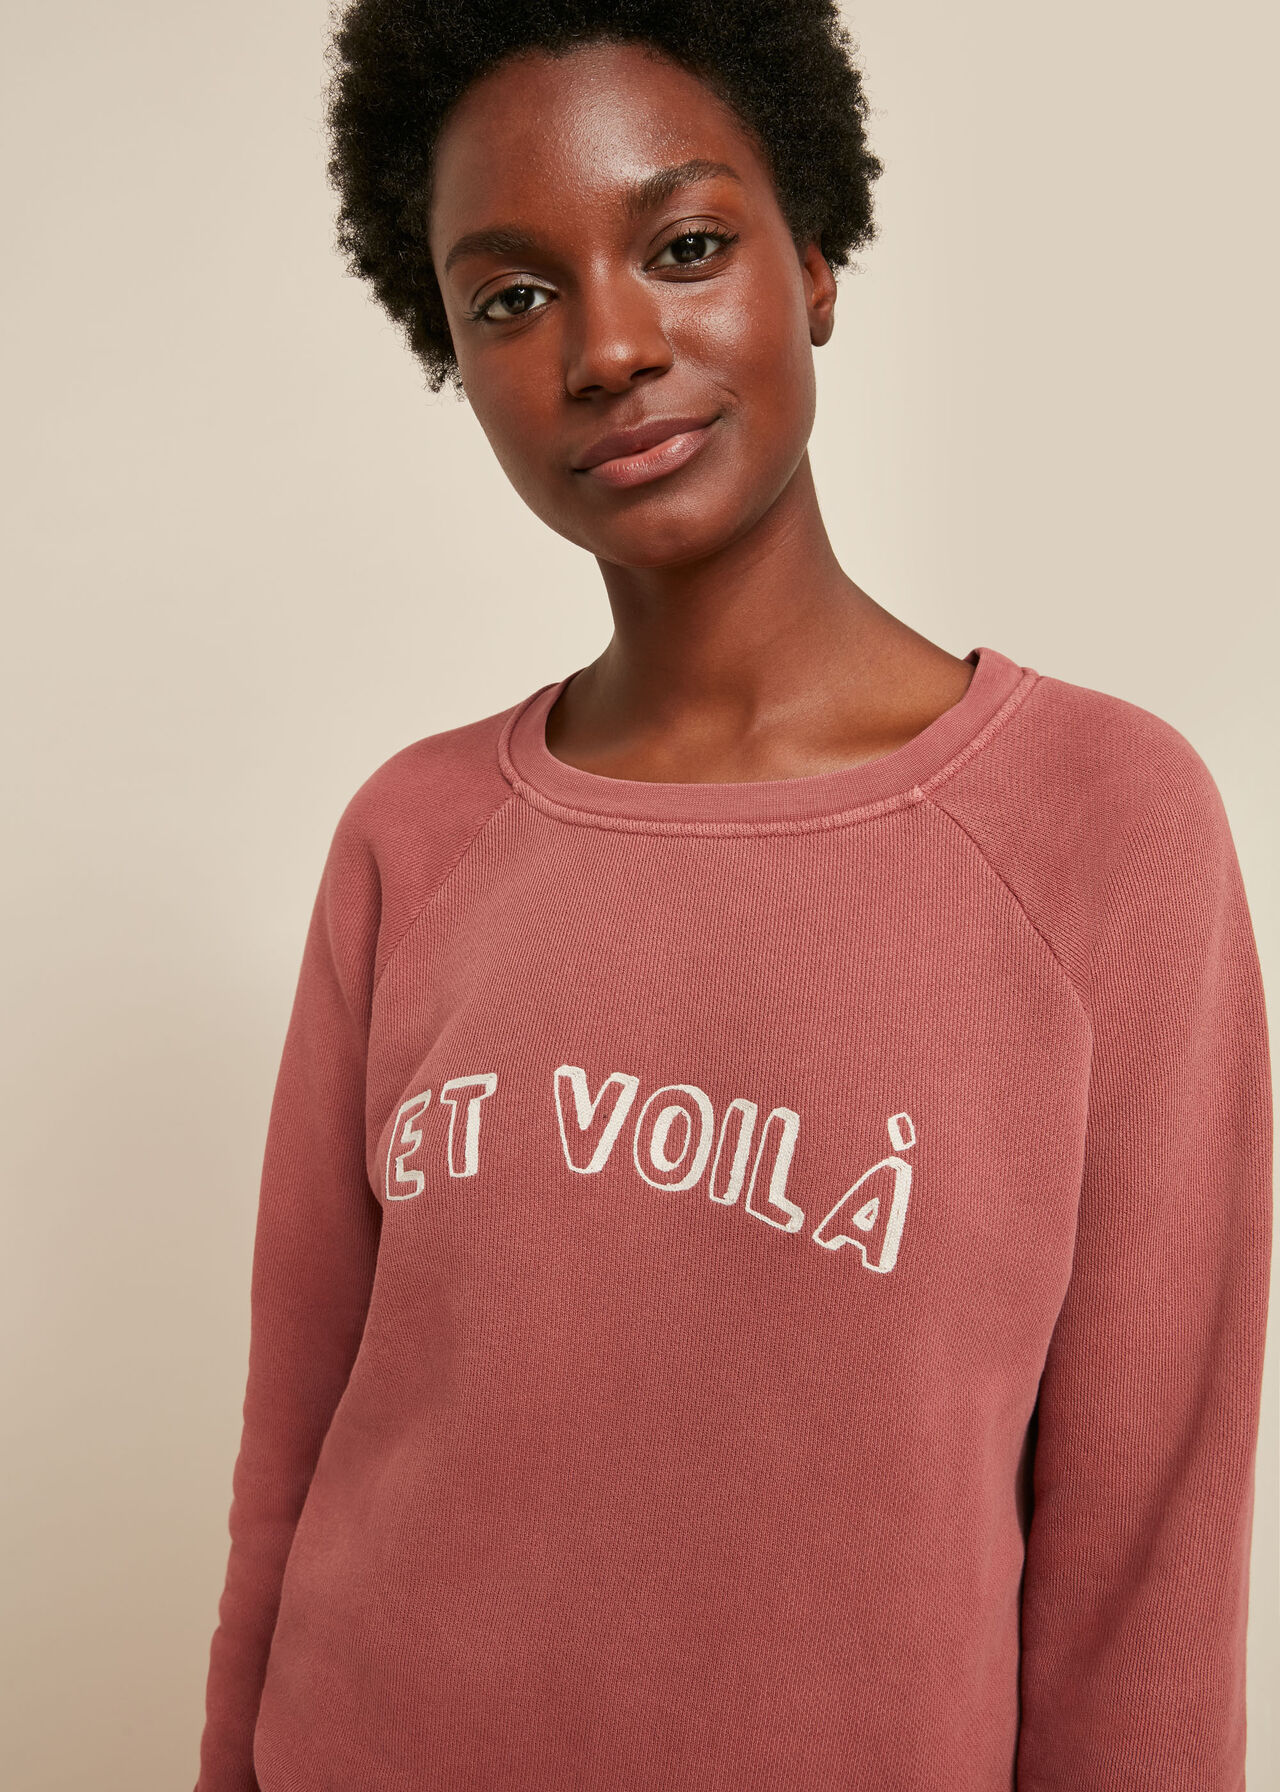 Et Voila Logo Sweatshirt